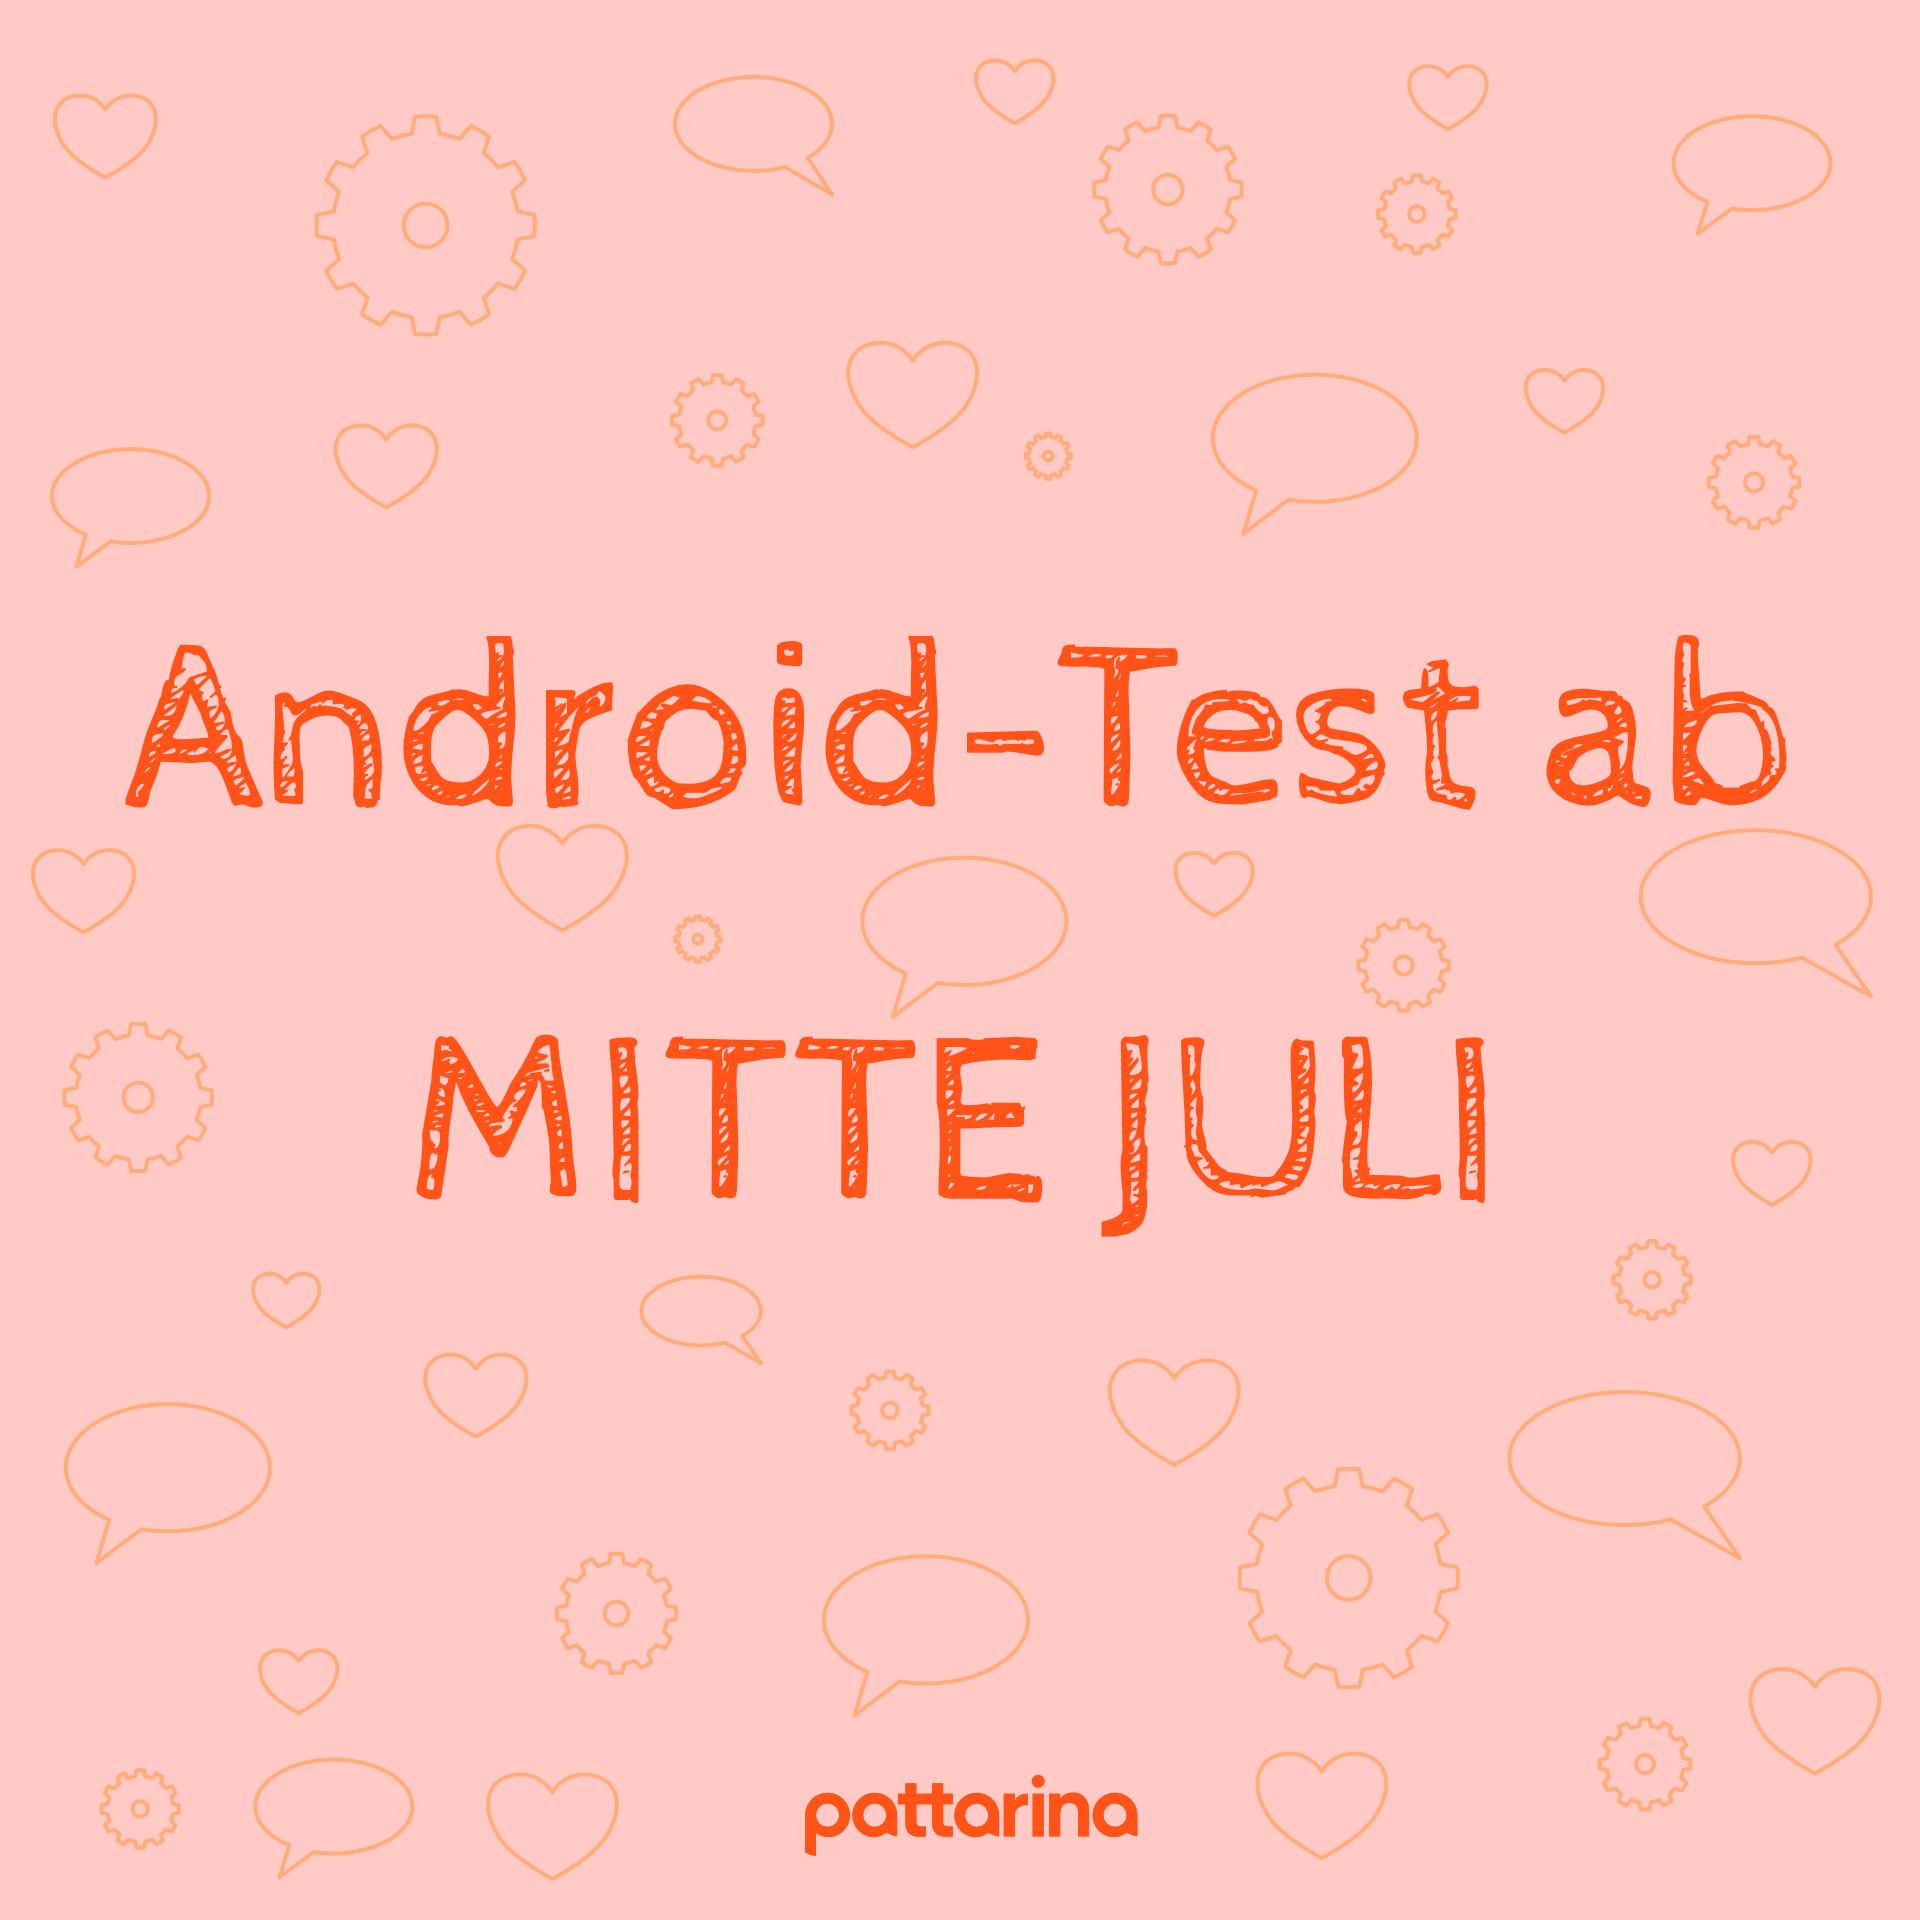 Pattarina im Android-Test ab Mitte Juli